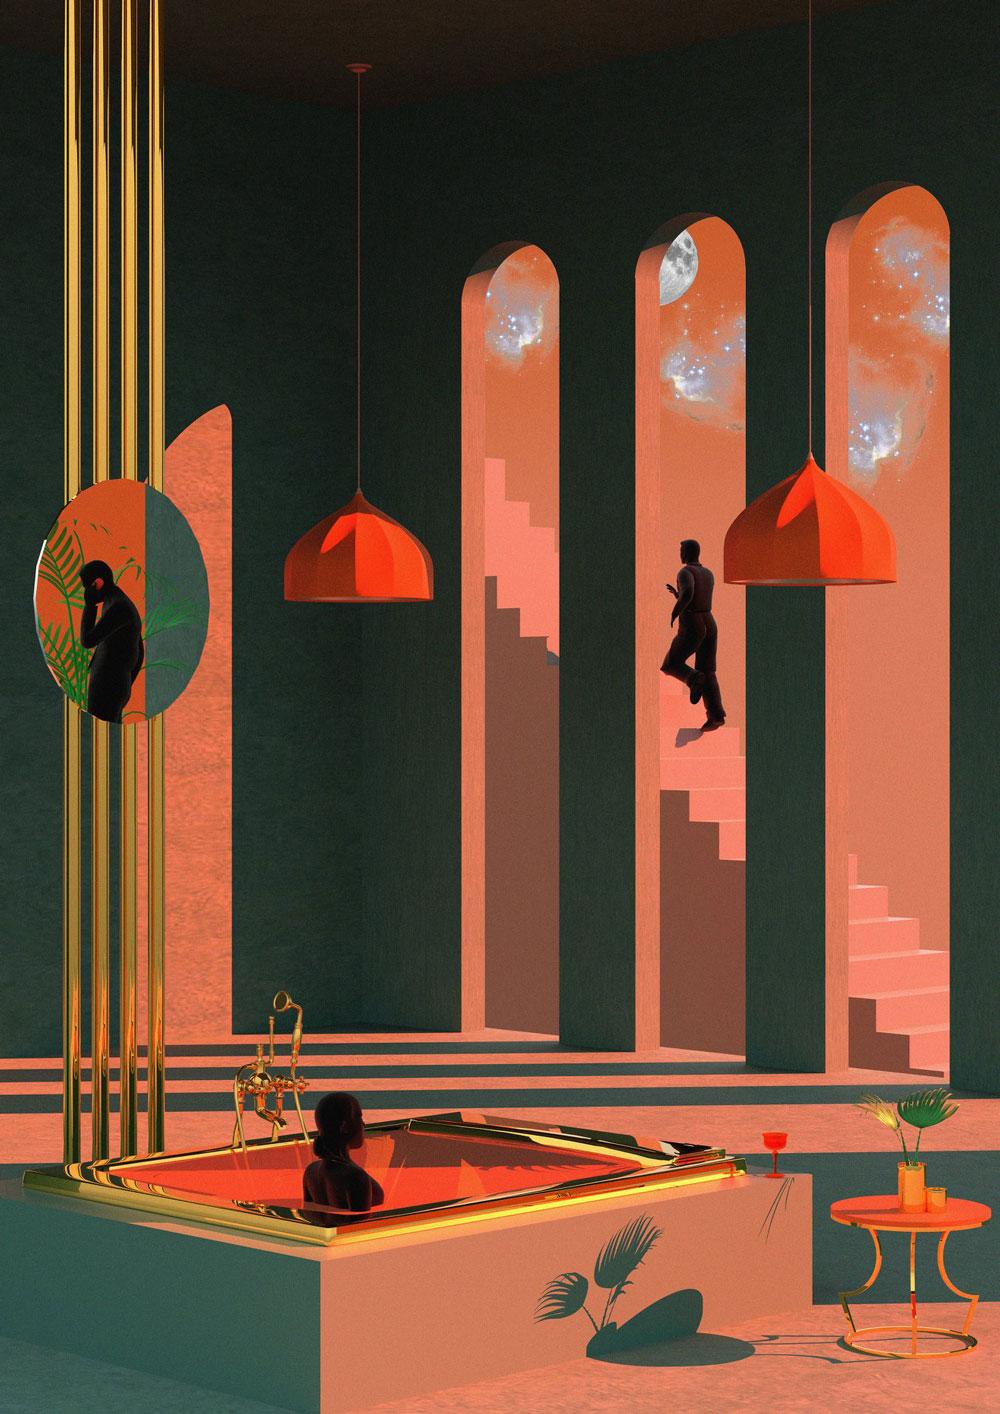 Tishk-Barzanji-Visual-Atelier-8-Squarespace-Interview-14.jpg